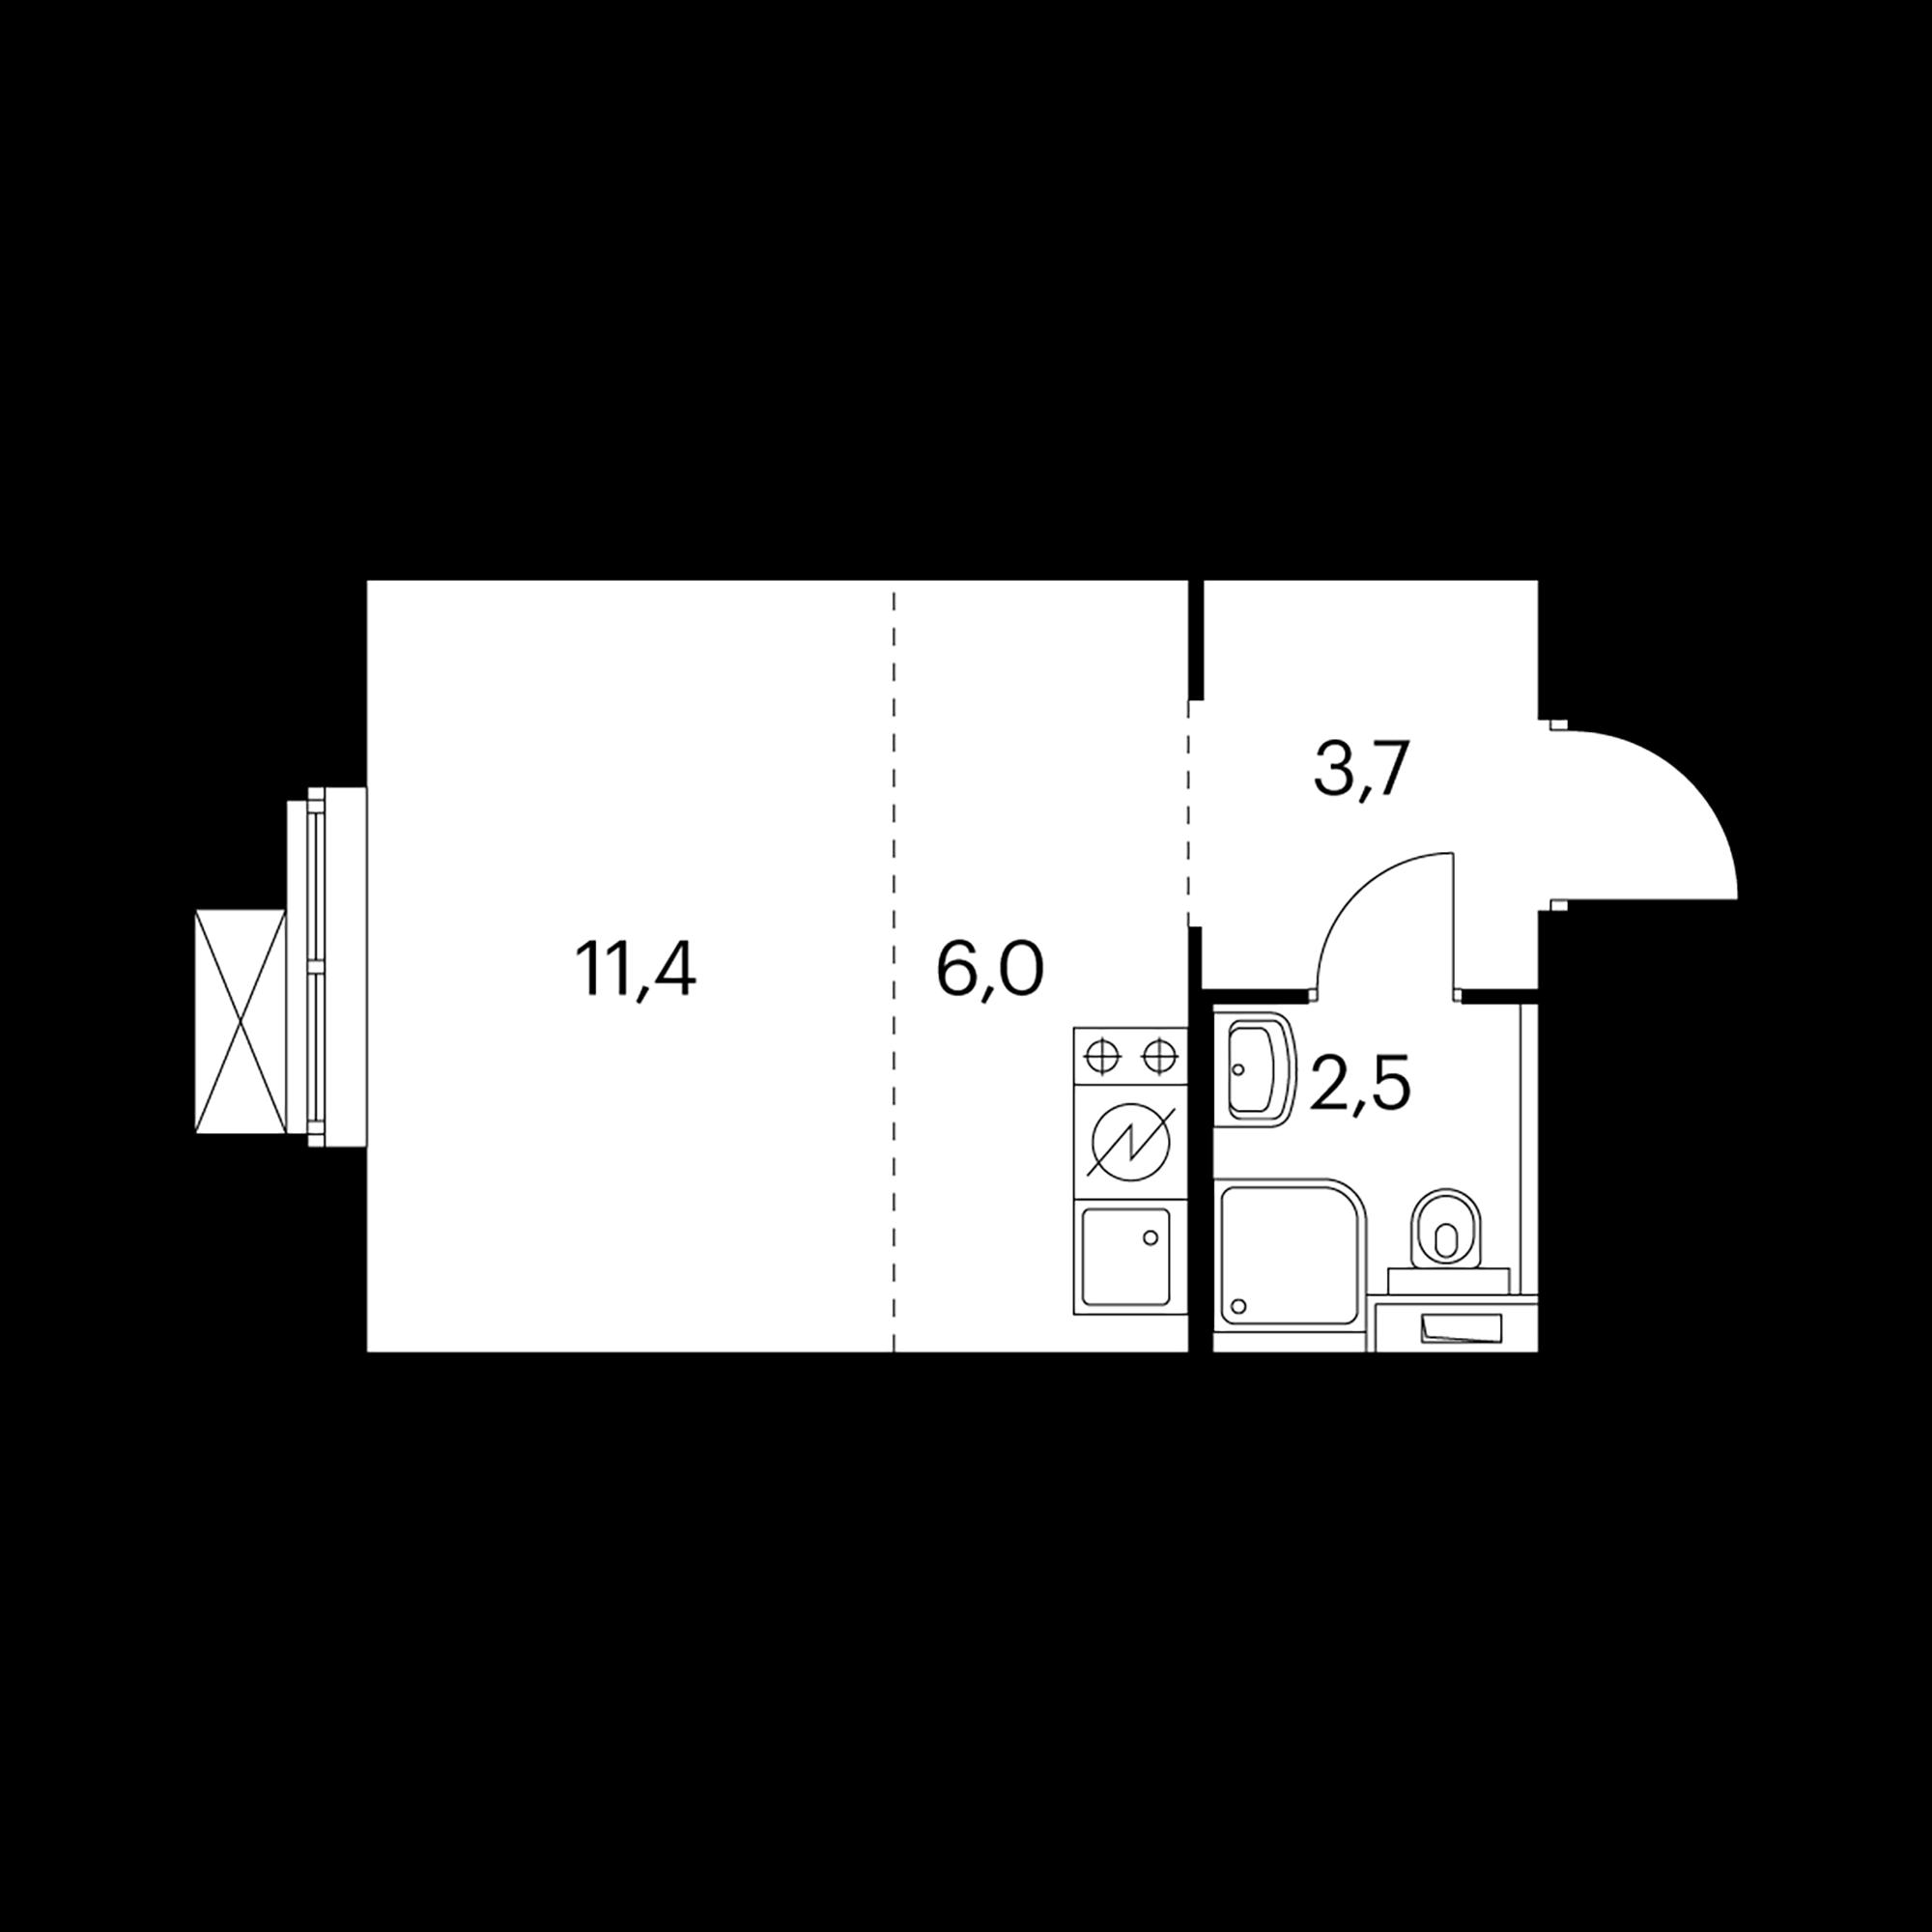 1NS1_4.2-2